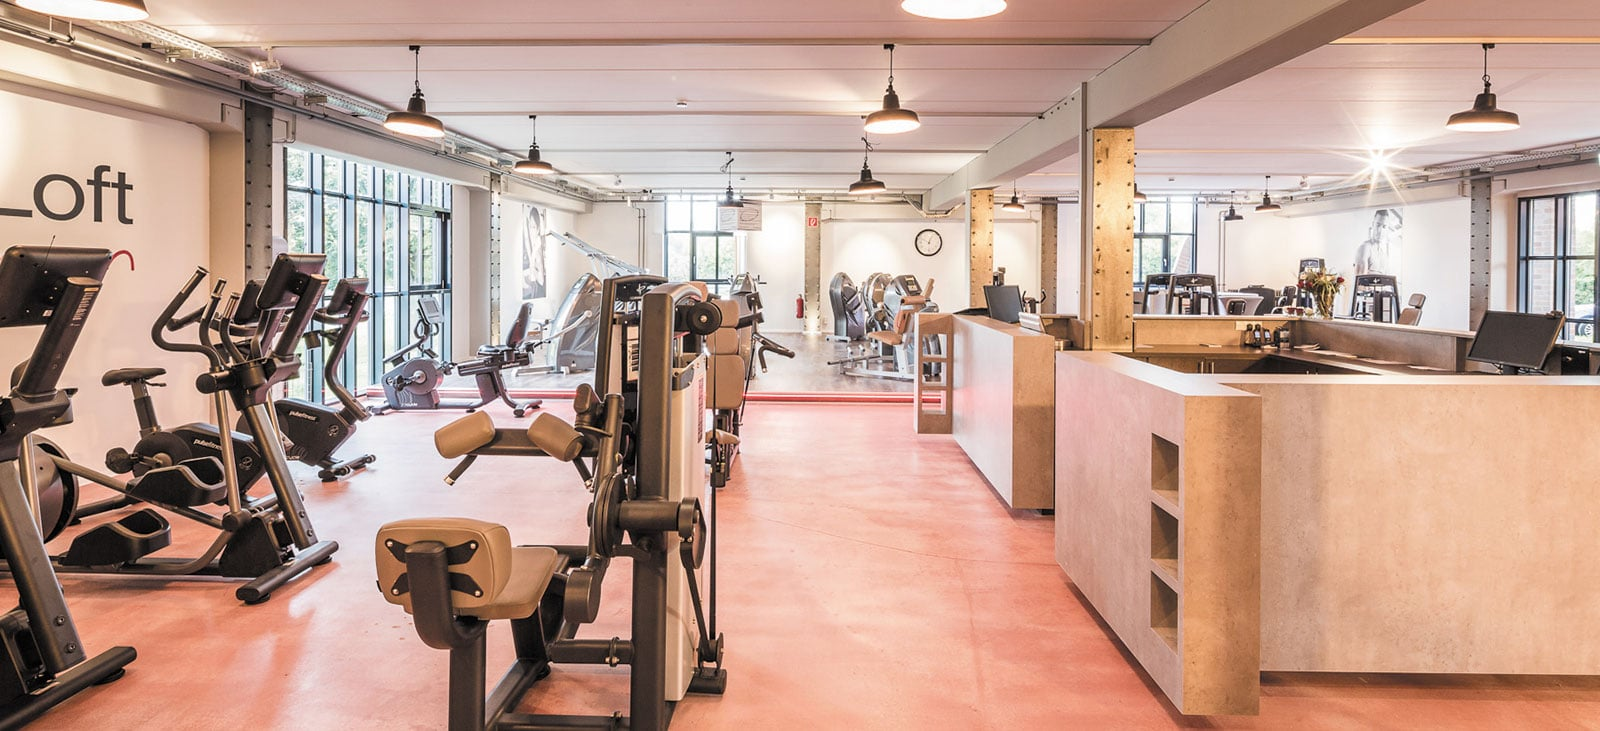 Fitness-Loft-Gundelfingen-Trainingsbereich-1600x731px